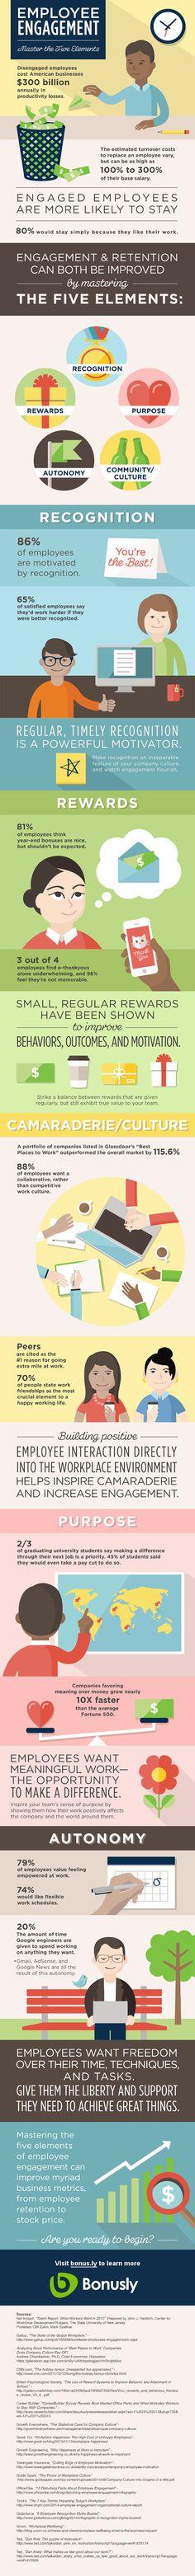 Business and management infographic & data visualisation 5 Key Elements to Mastering Employee Engagement Infographic Description 5 Key Elements to Employee Retention, Employer Branding, Talent Management, Management Tips, Project Management, Employee Recognition, Employee Engagement, Customer Engagement, Business Motivation